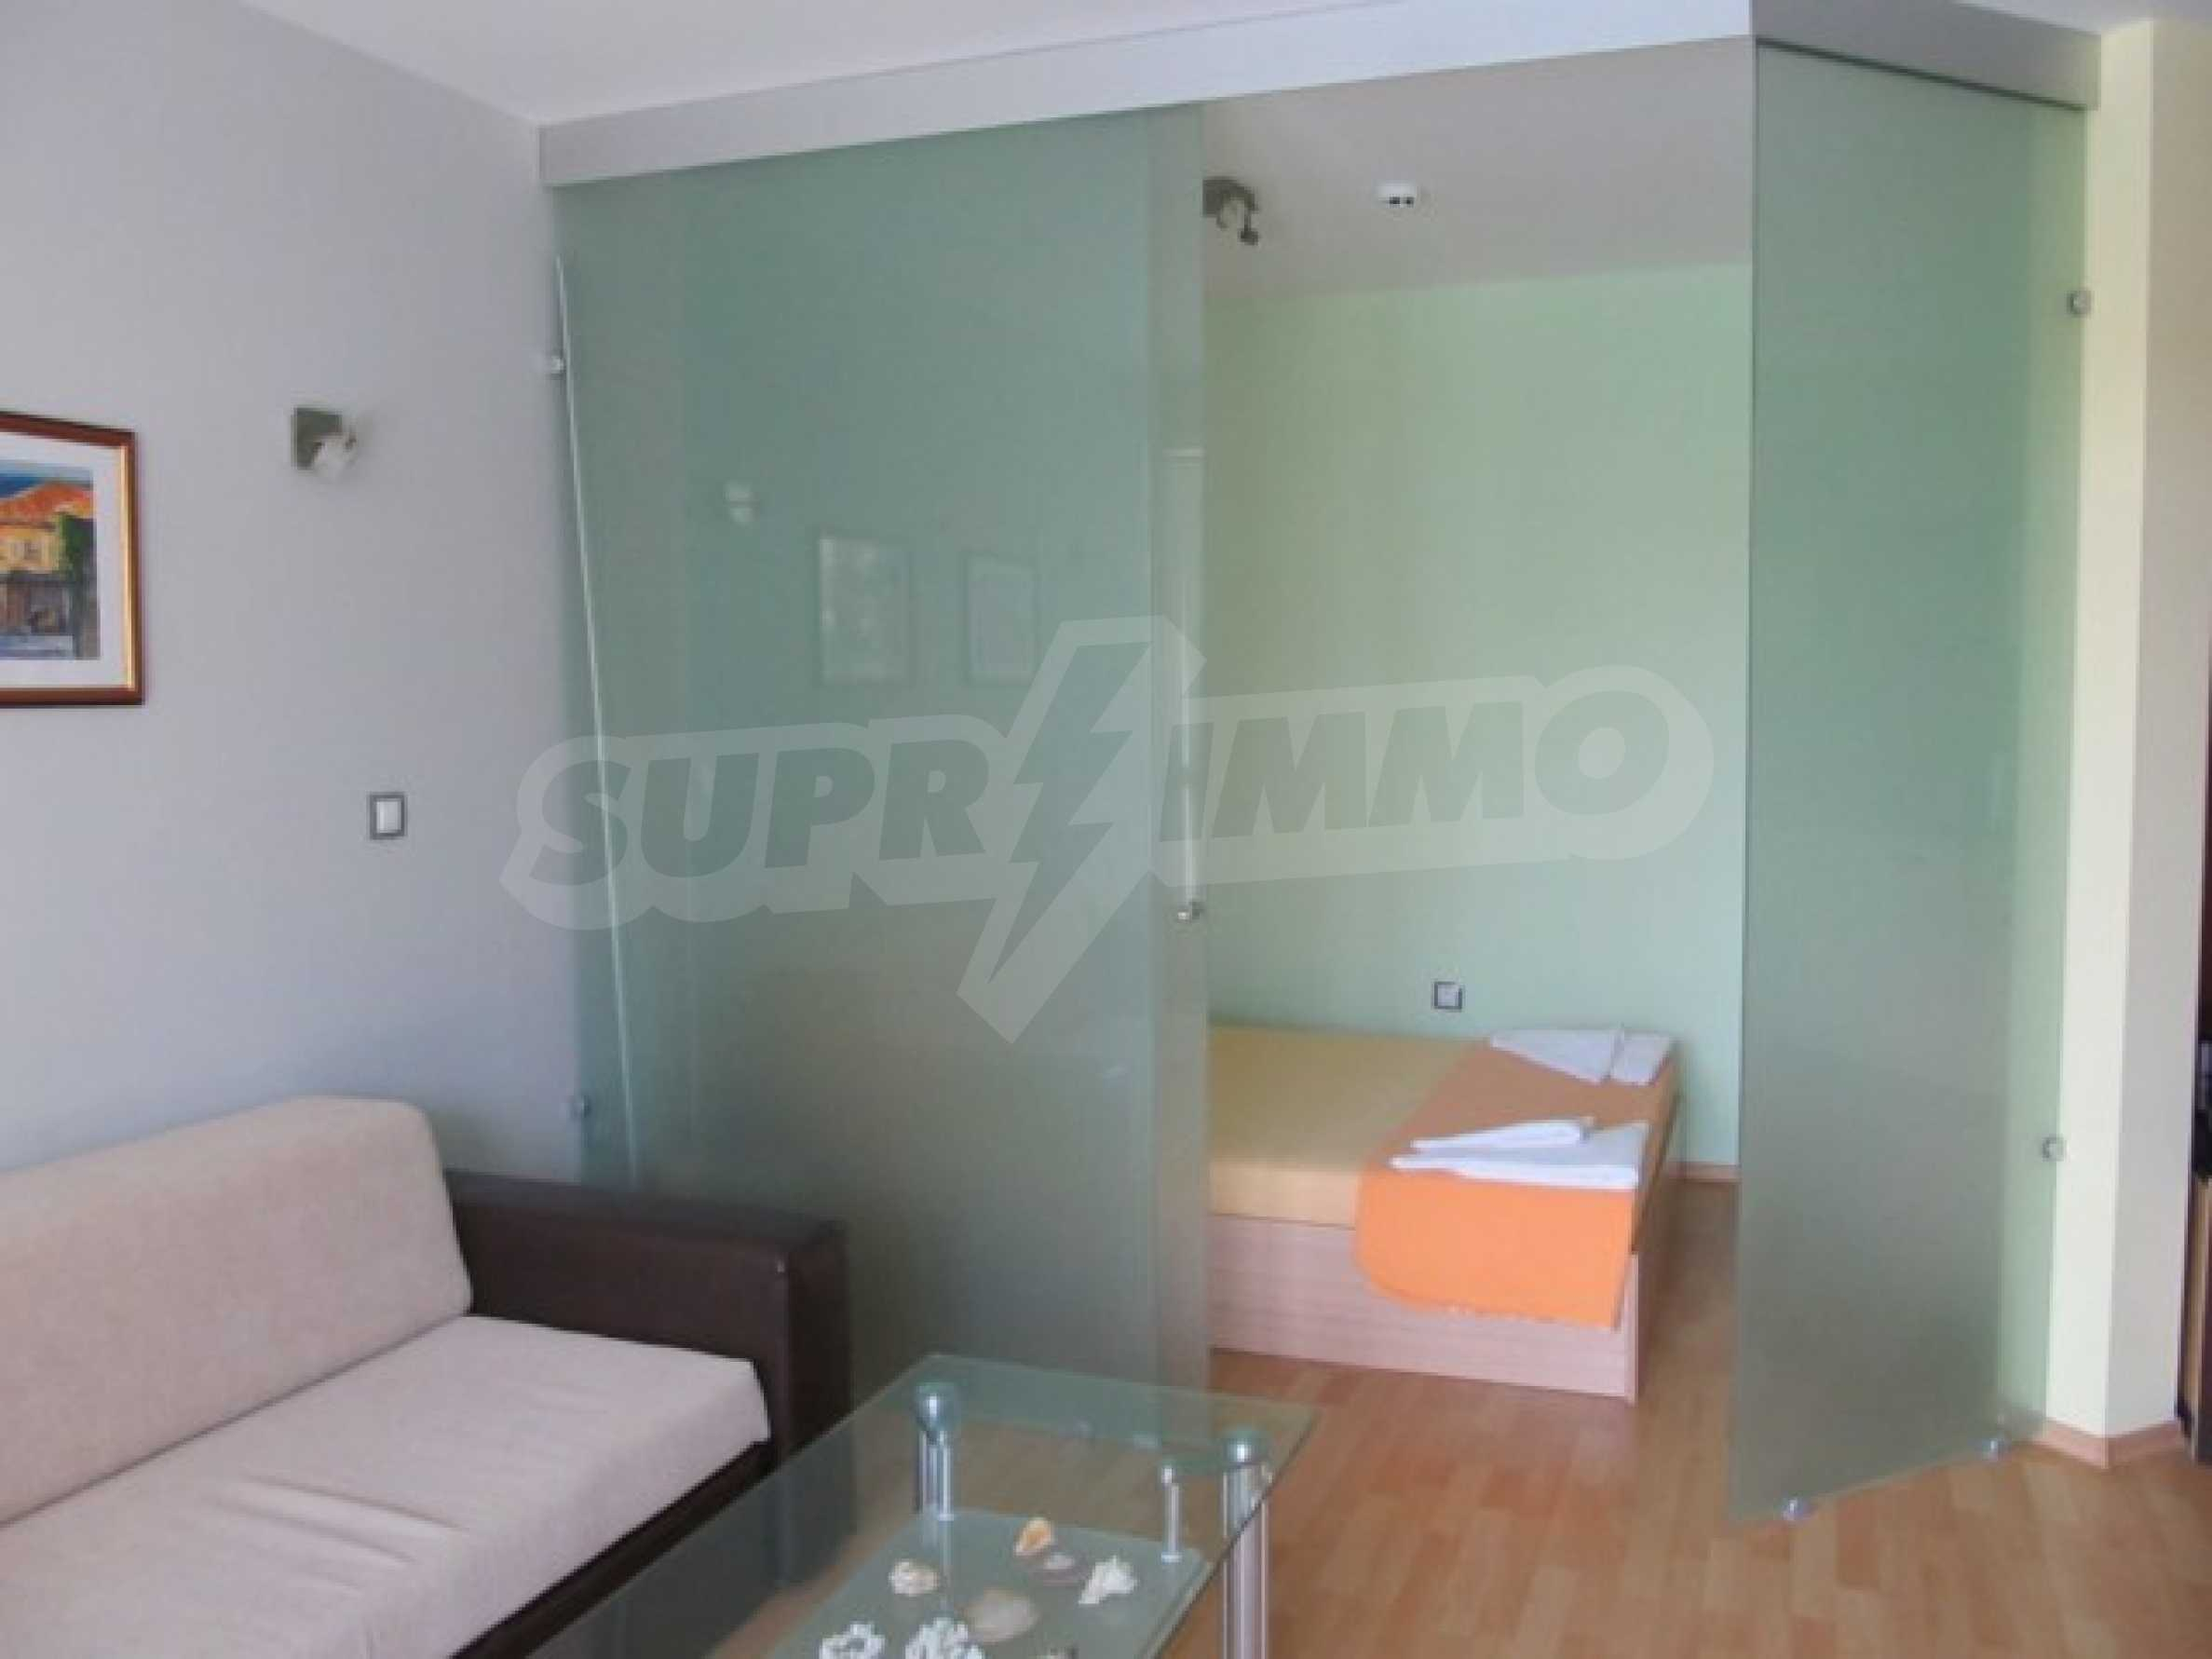 Тристаен апартамент за продажба в Поморие 17